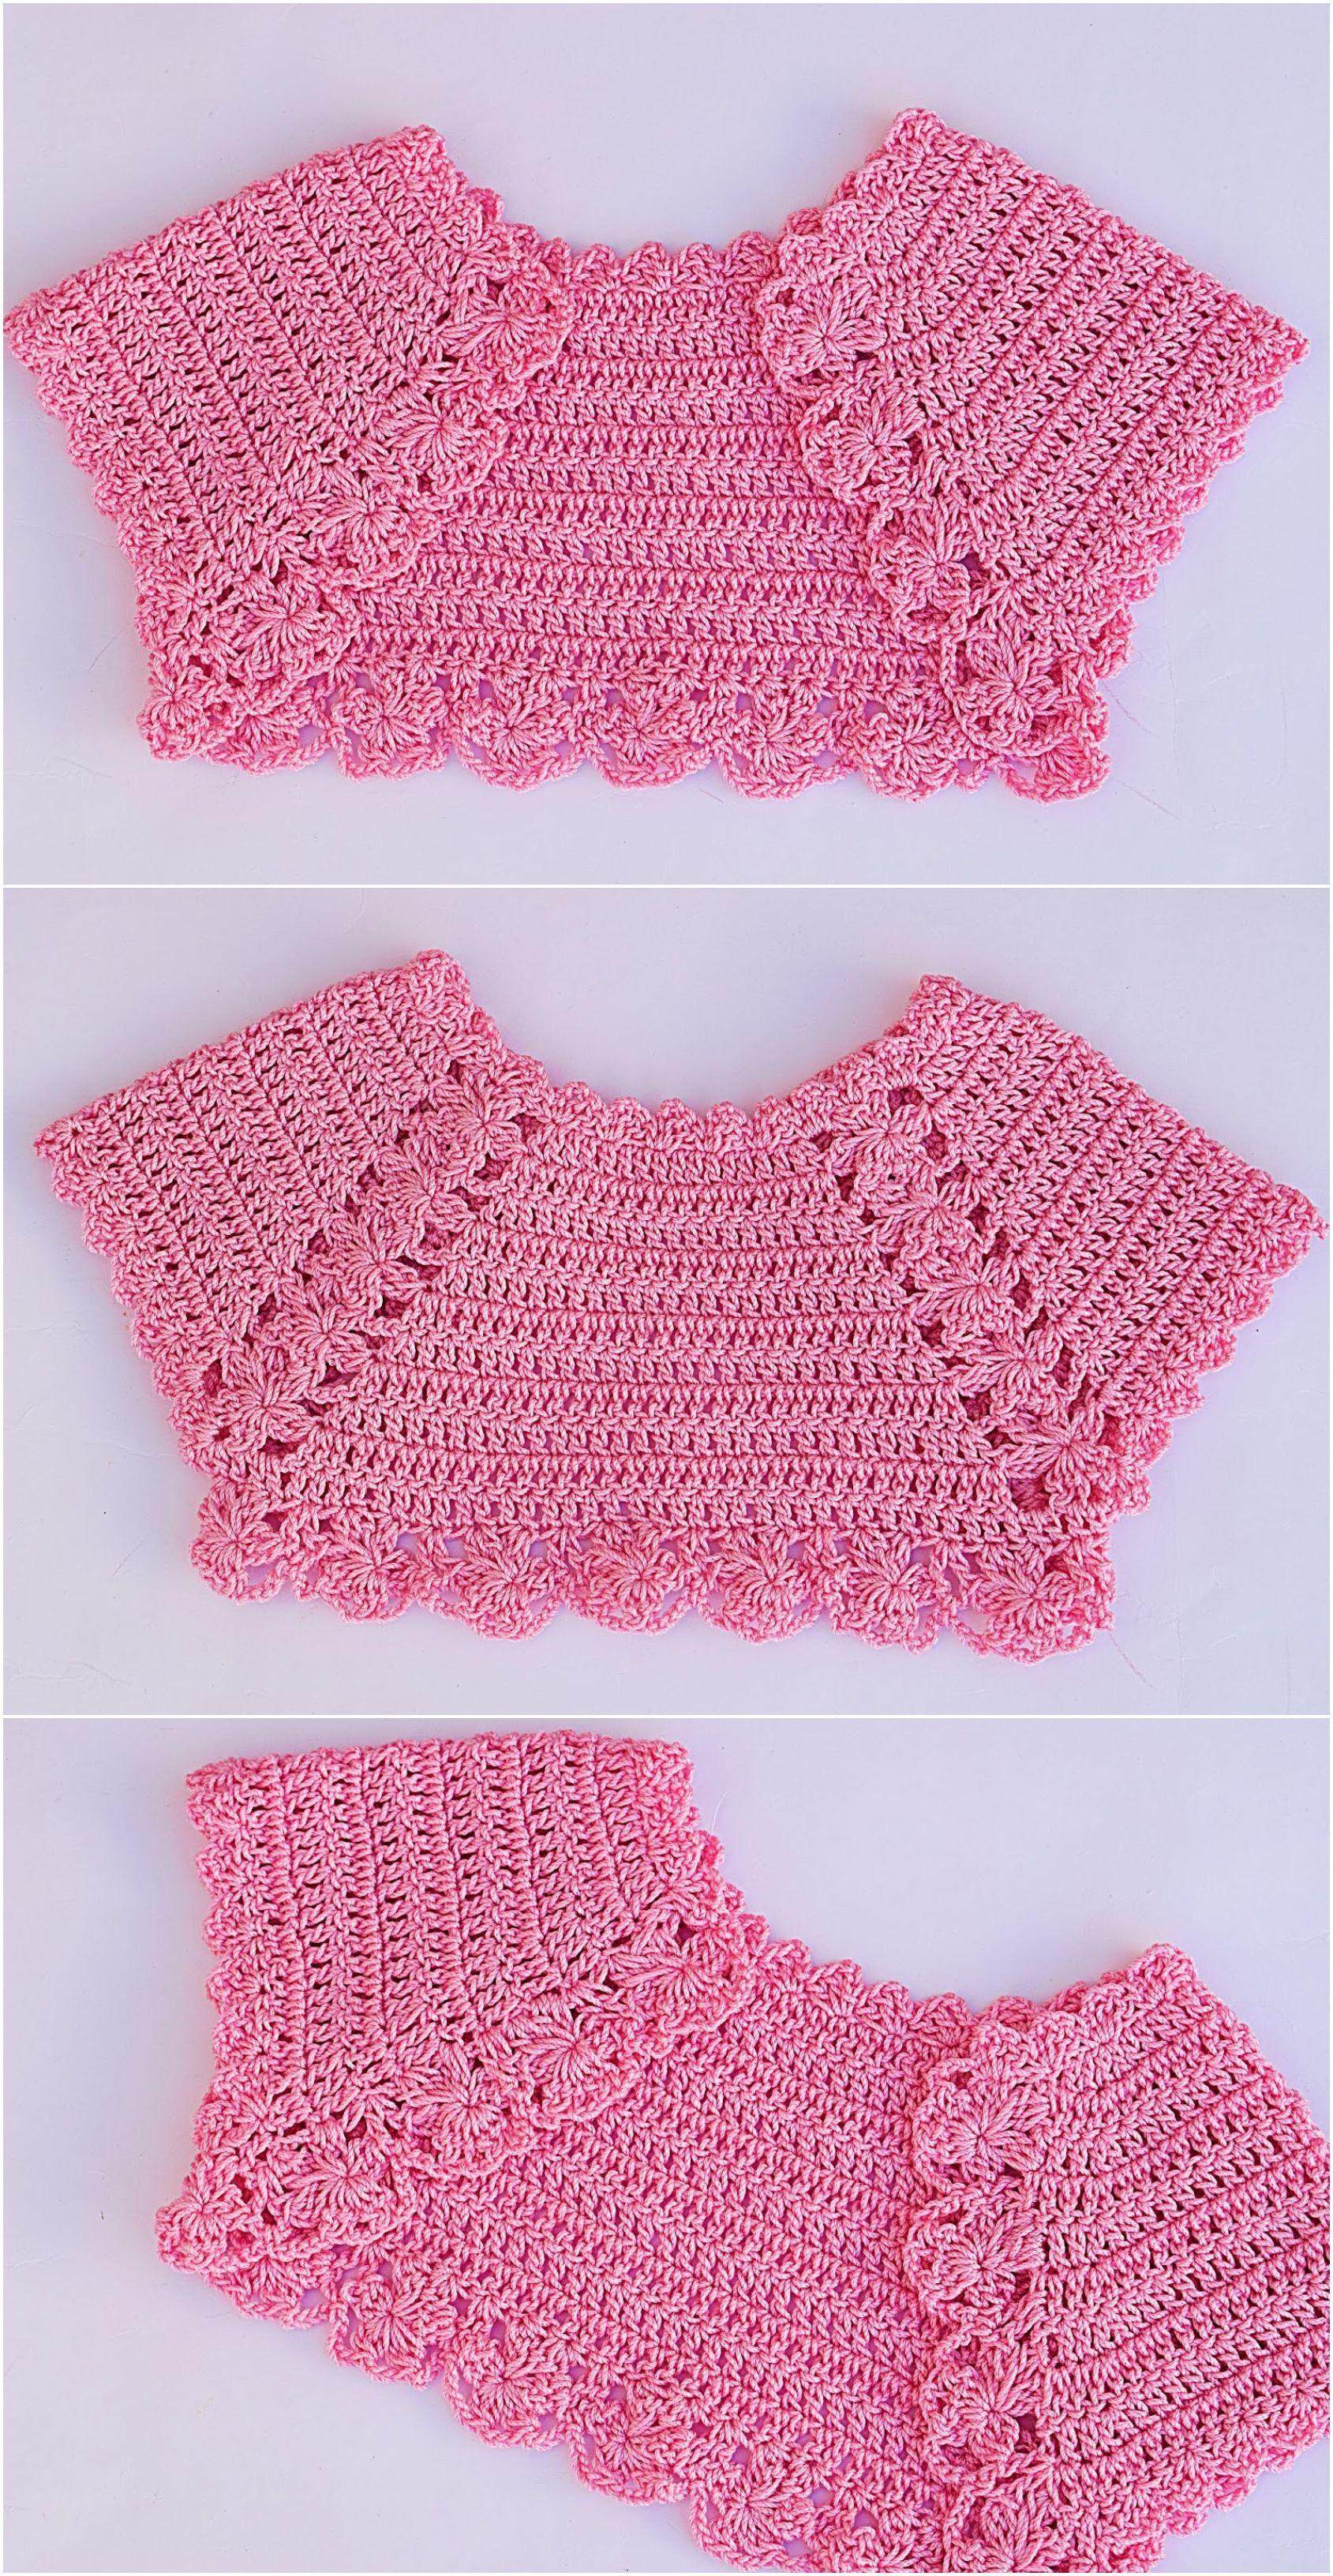 Crochet Baby Girl Bolero Crochet Babyclothespatterns Babyclothes Babysweater Babyshoes Babyblanket Baby Baby Knitting Patterns Krose Ust Serbest Orgu